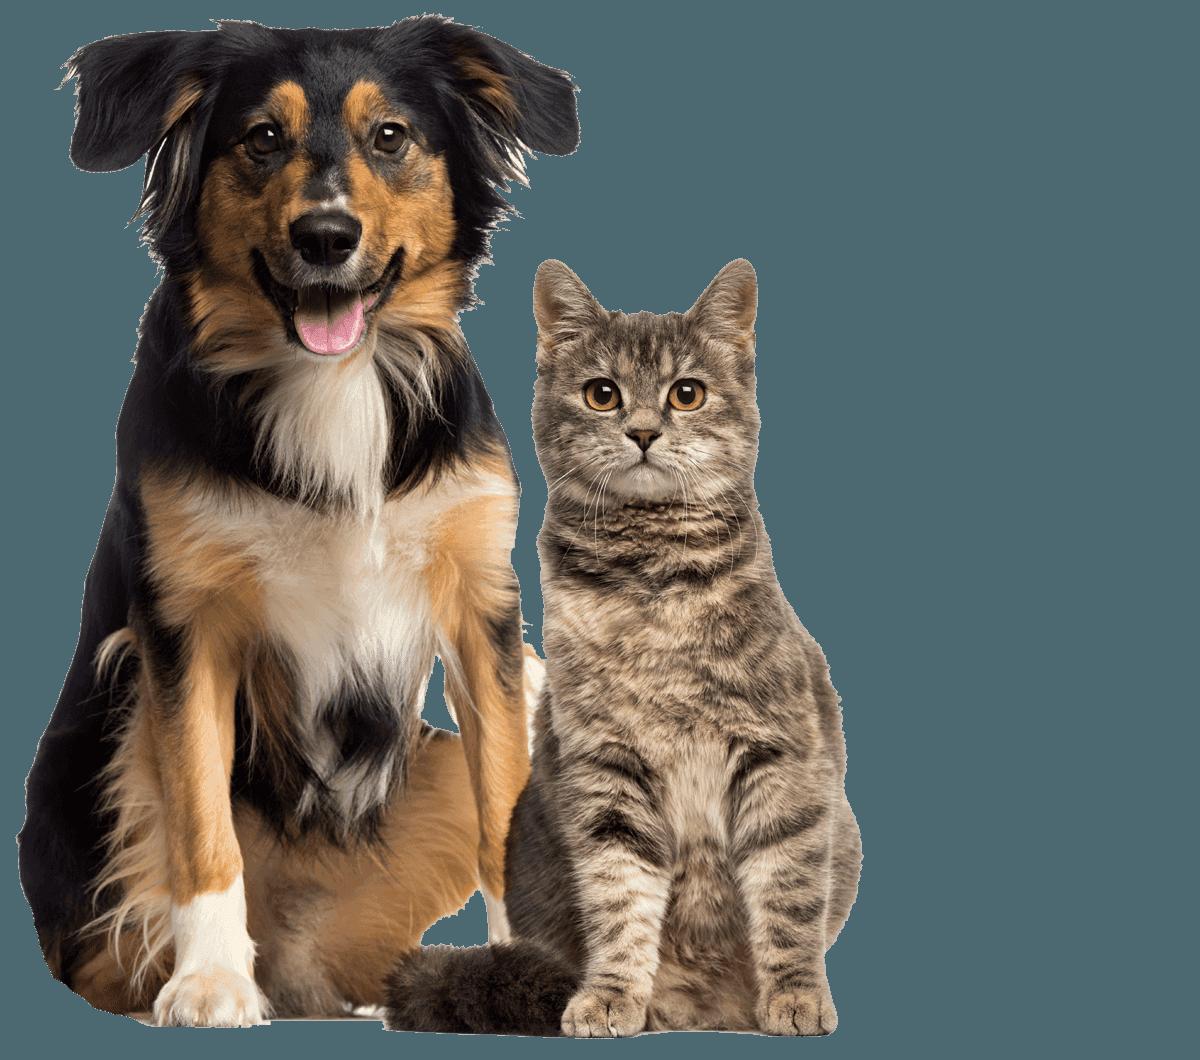 Charlotte veterinarian tour